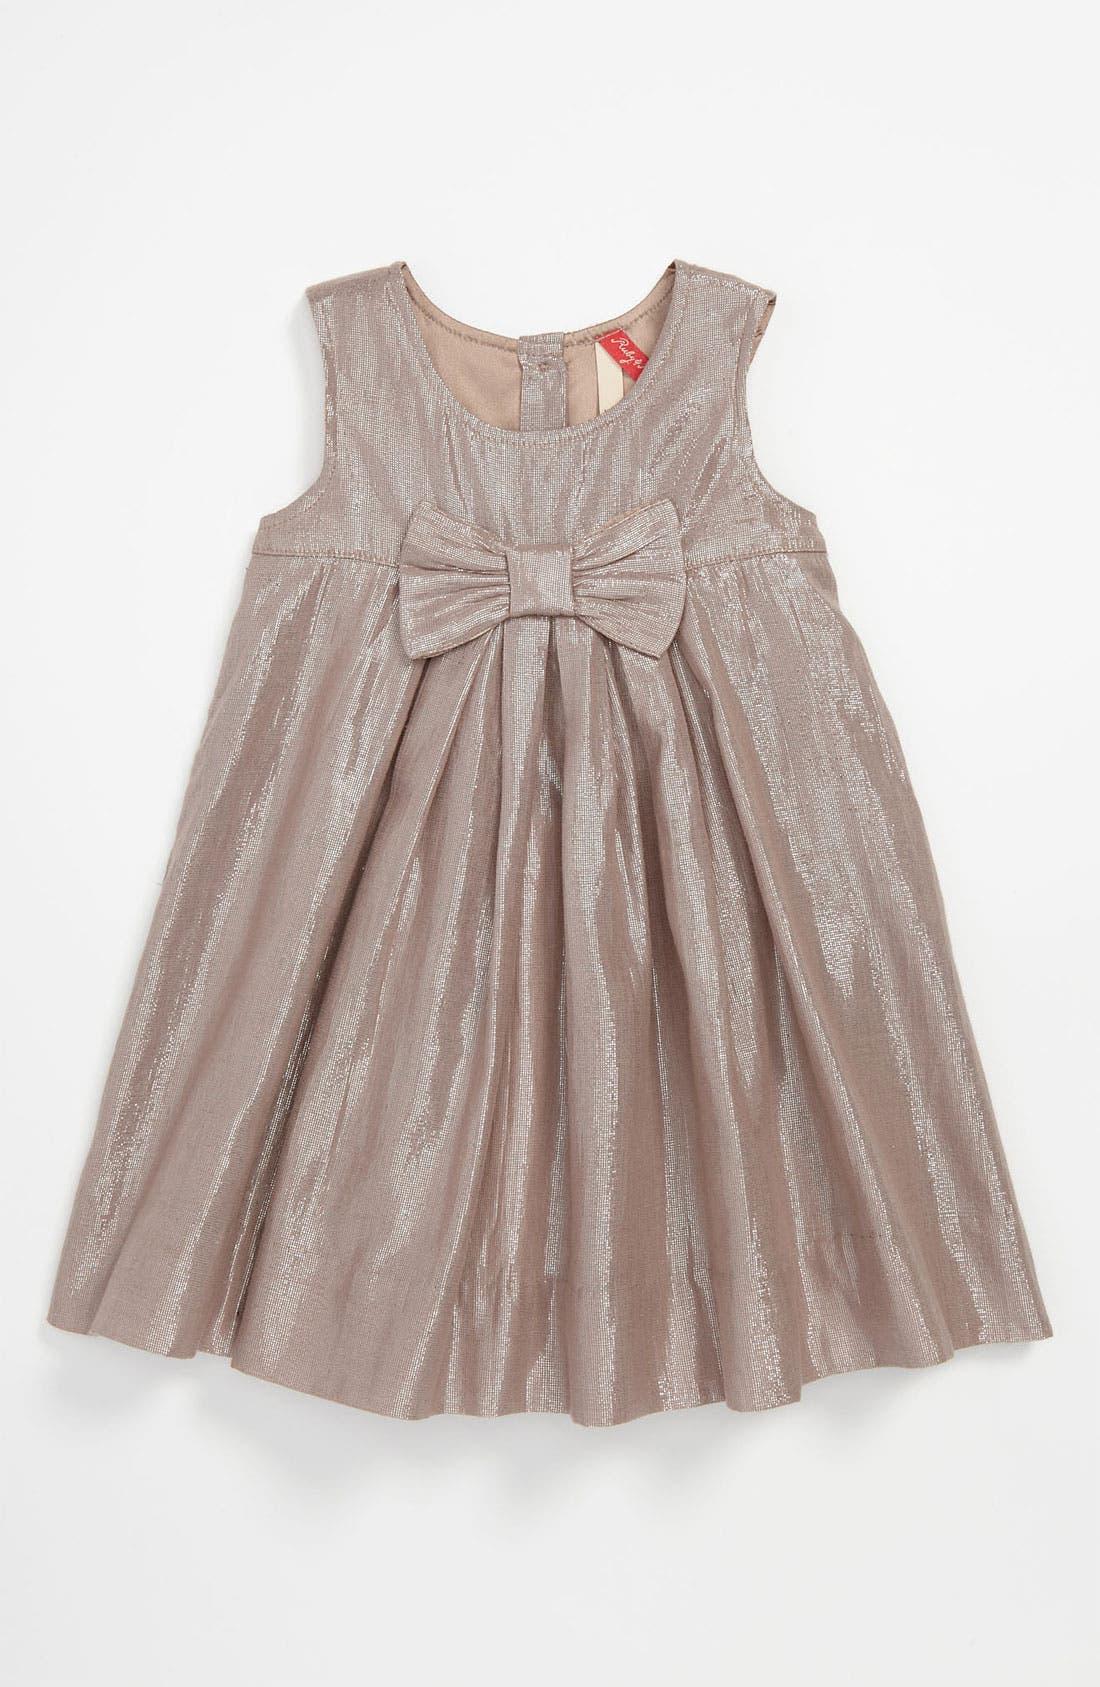 Main Image - Ruby & Bloom 'Brooke' Dress (Infant)